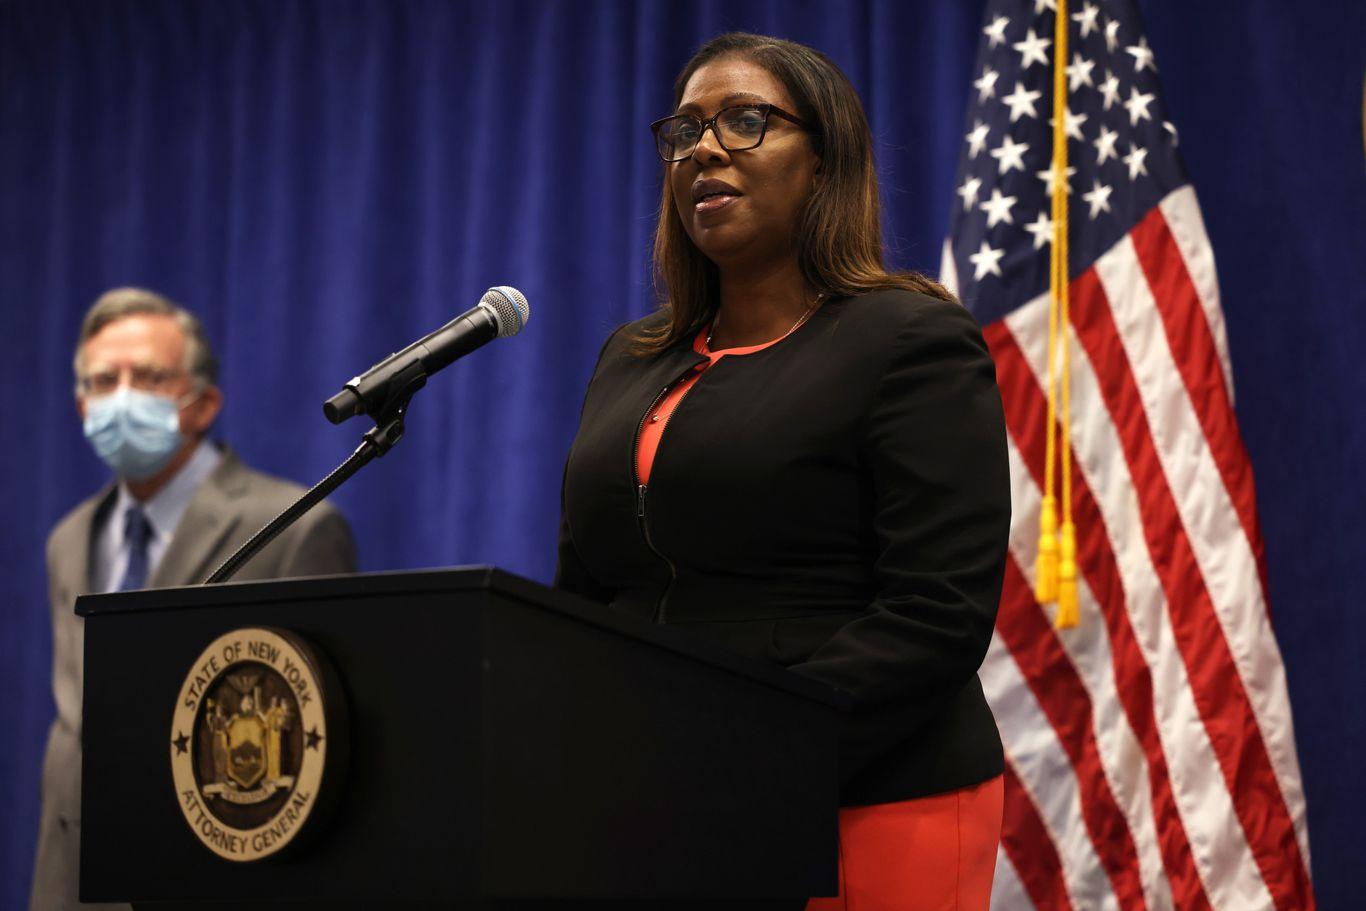 N.Y. attorney general to organize grand jury on Daniel Prude death thumbnail